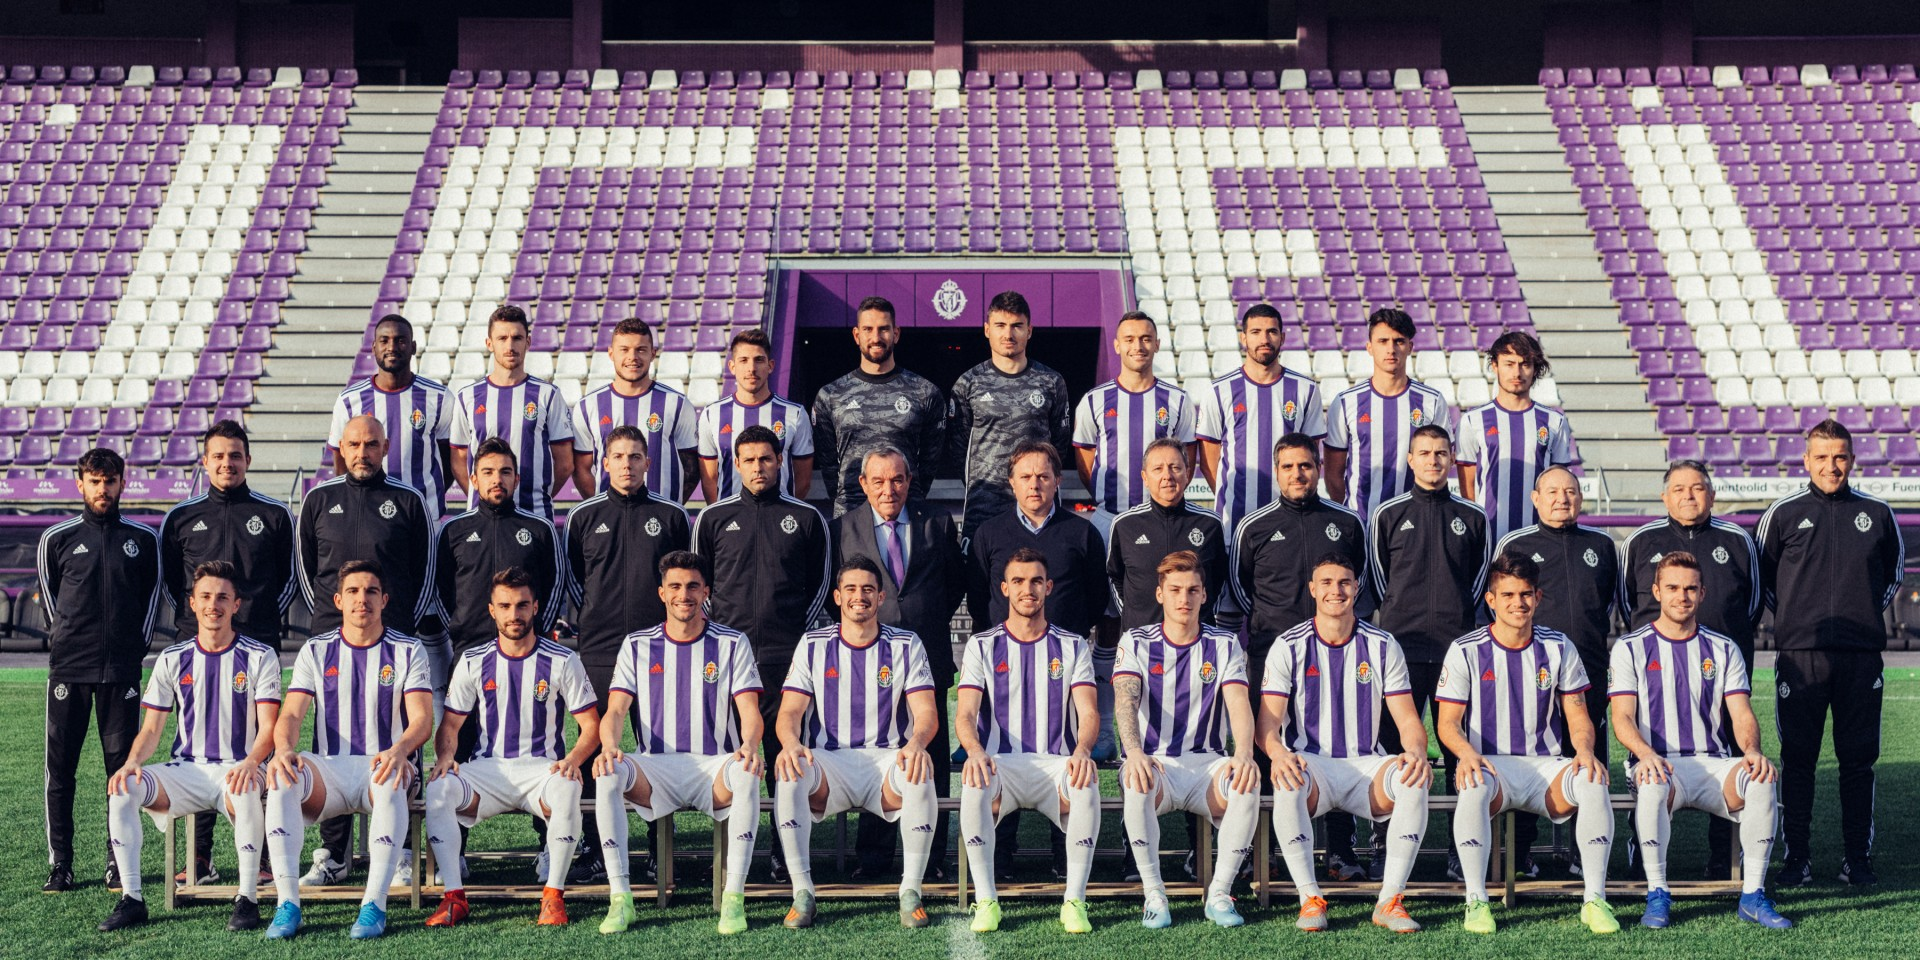 Real Valladolid PROMESAS - Temporada 2019/20 - 2ª División B Grupo II Promesinhas